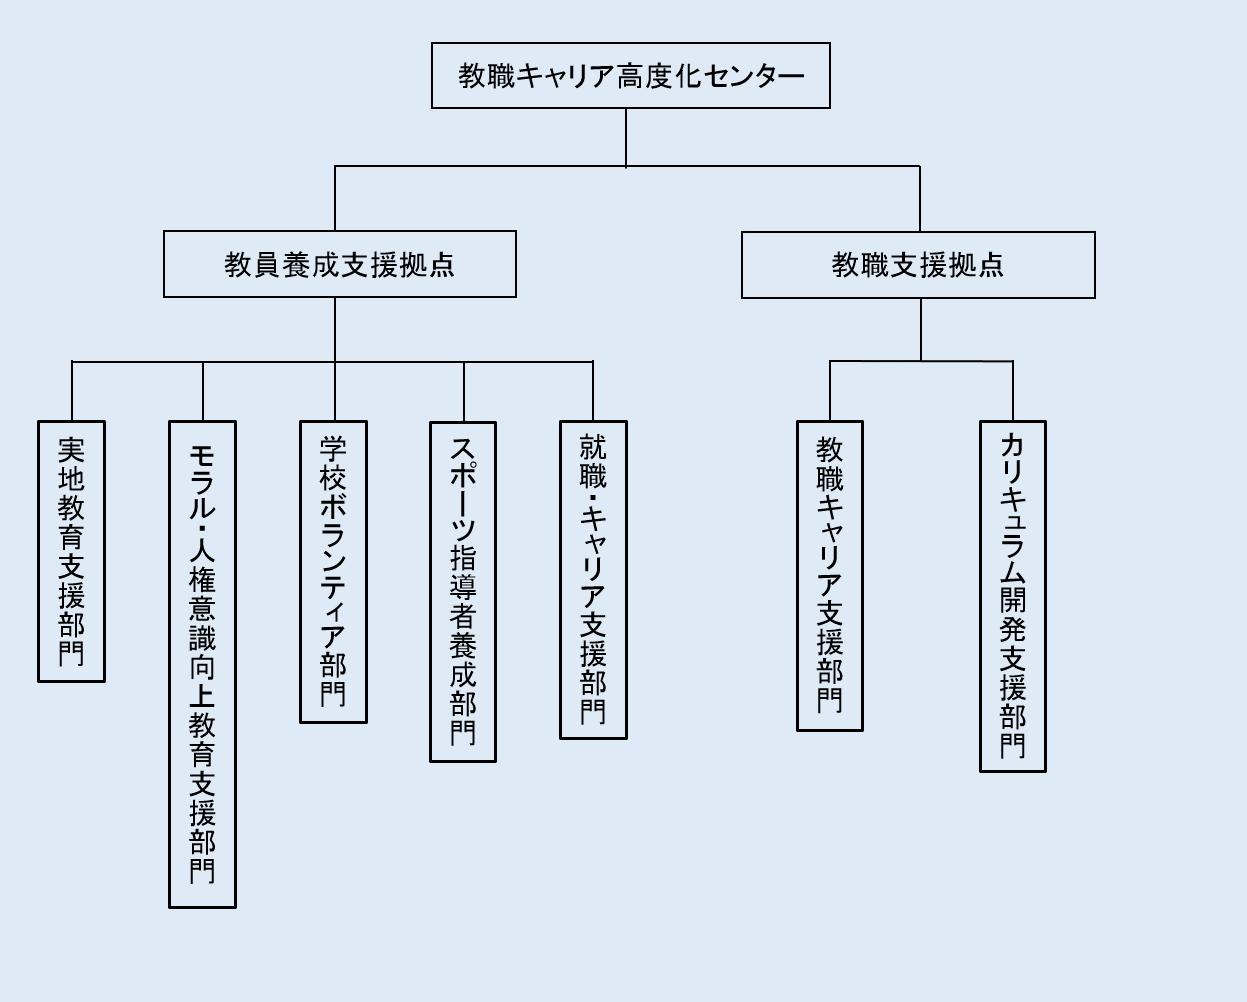 組織図.png